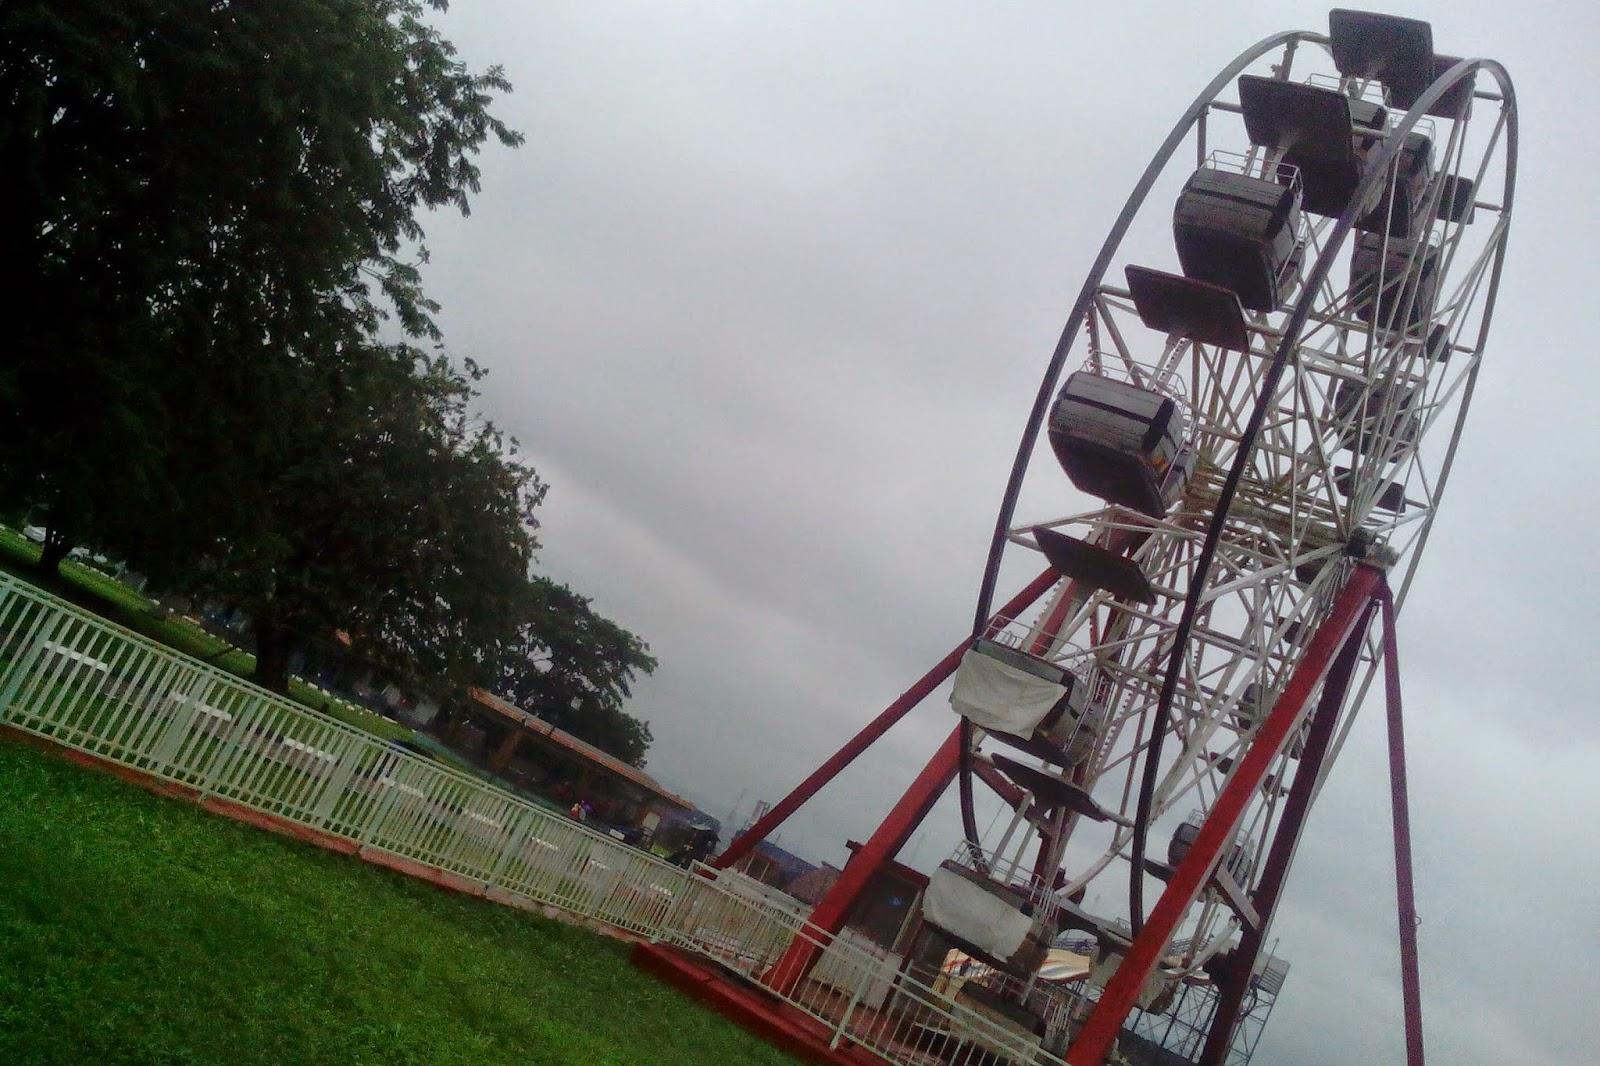 How to Start an Amusement Park How to Start an Amusement Park new images